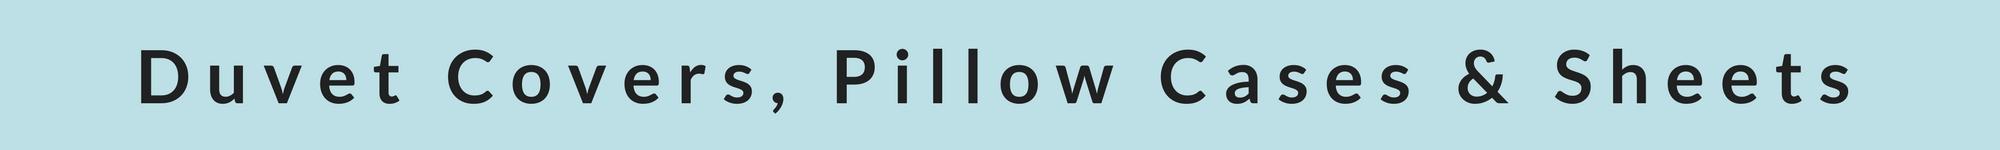 Duvets, Pillow Cases & Sheets